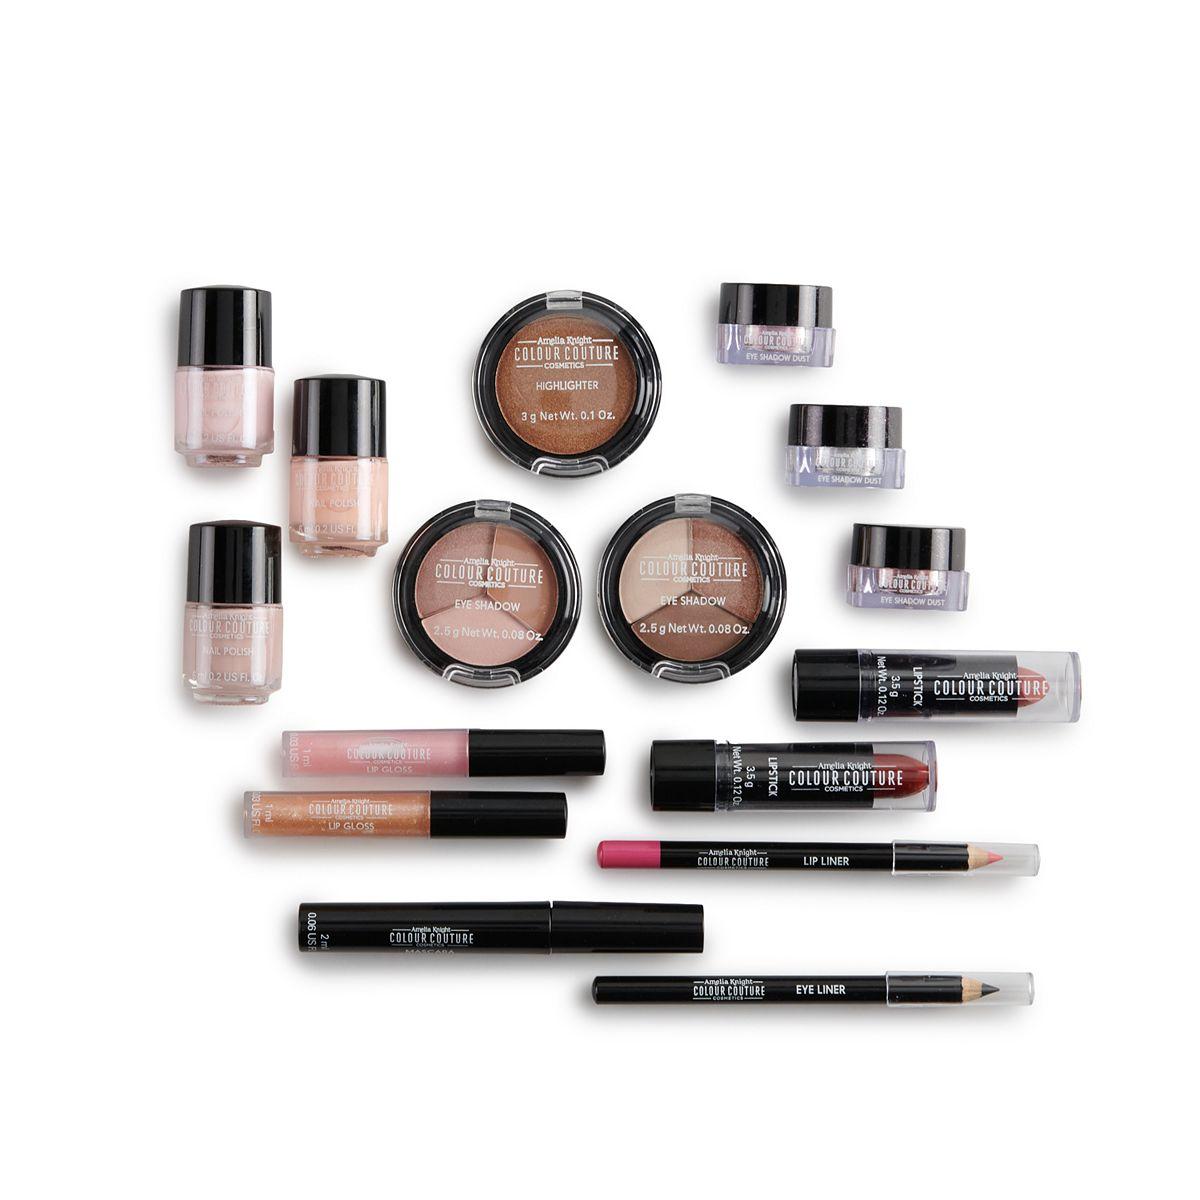 16-Piece Academy of Colour Makeup Set $13.50